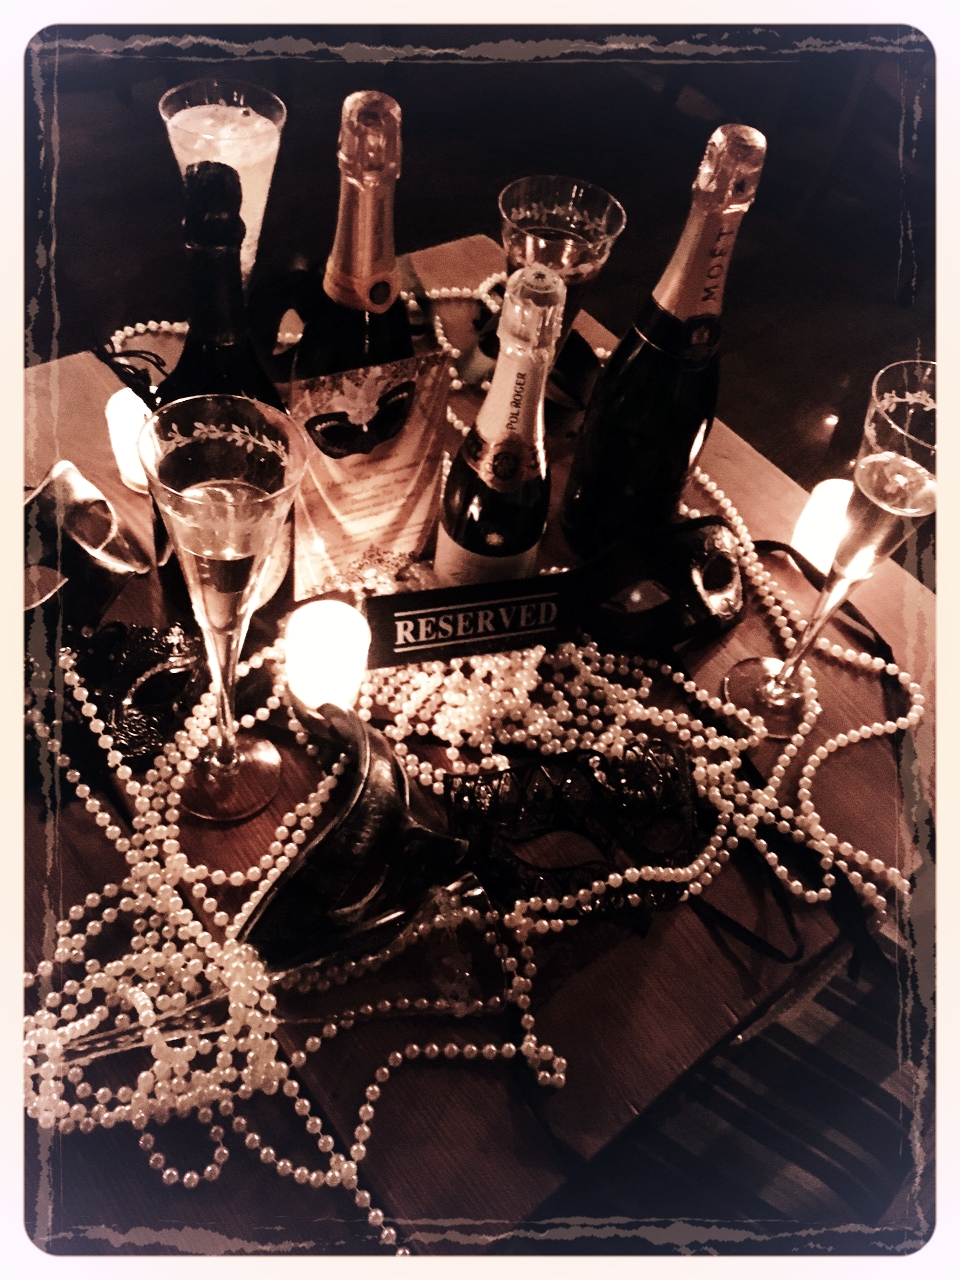 champagne bottle clip art 1.png